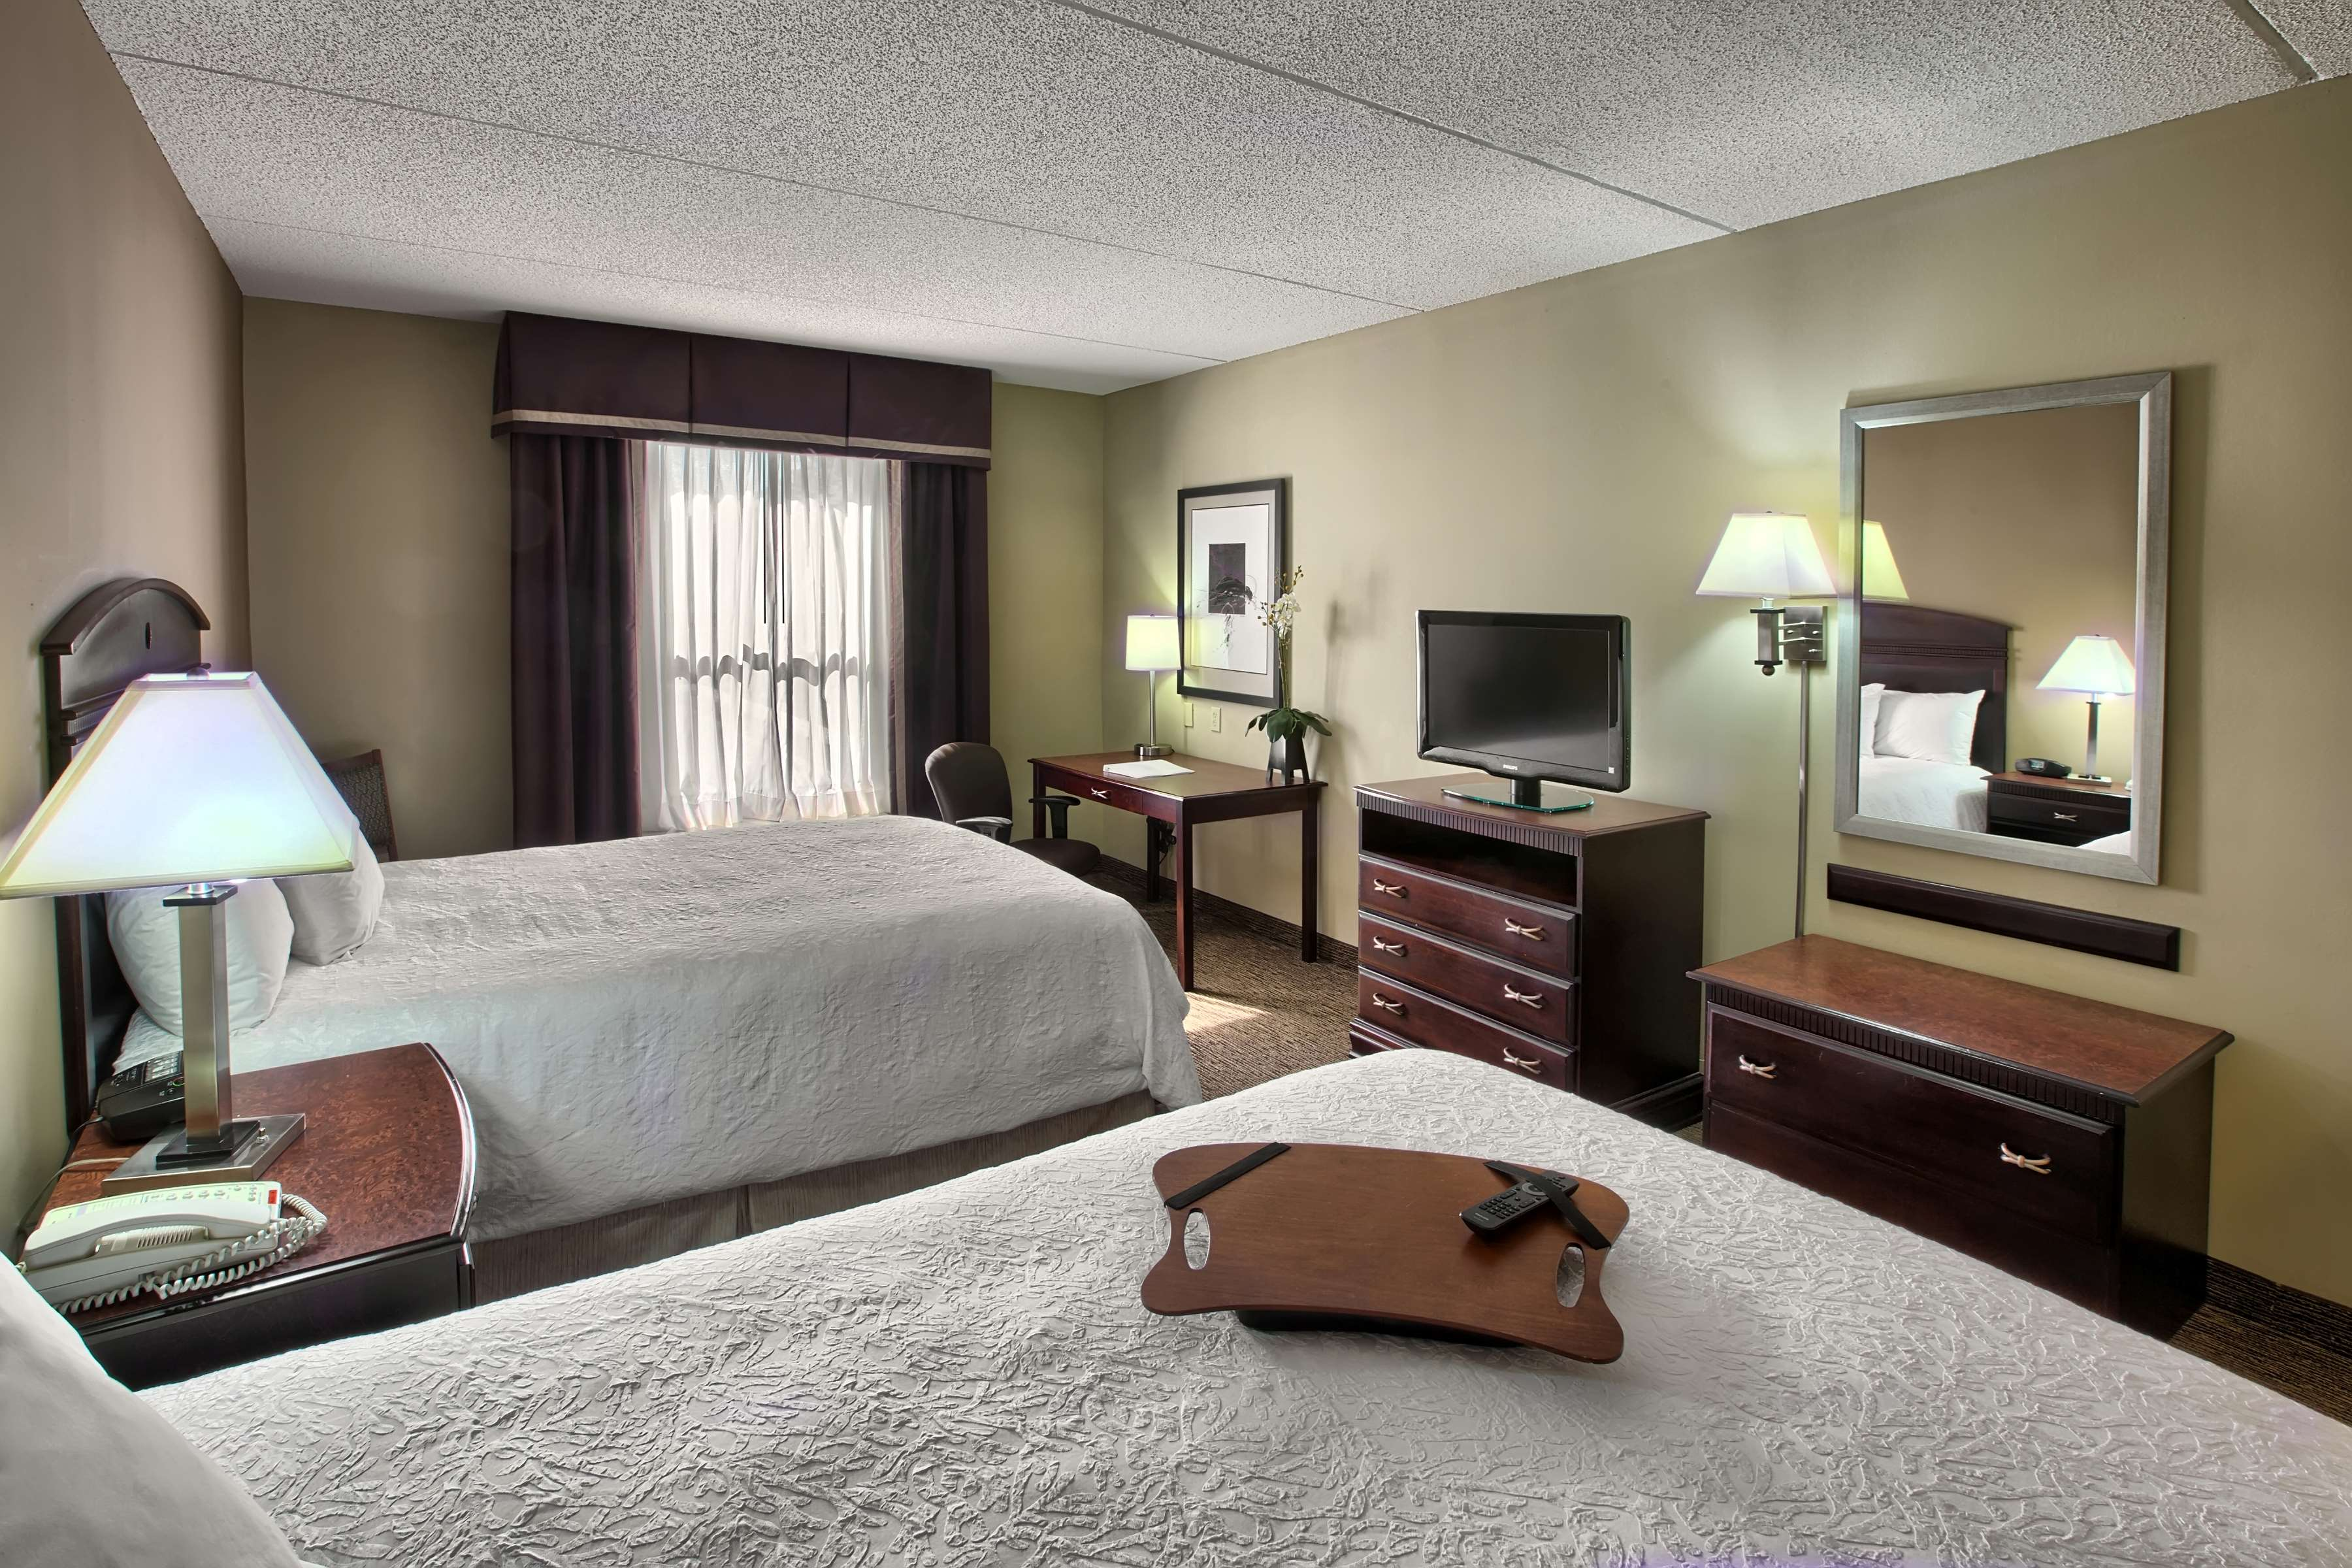 Hampton Inn & Suites Burlington image 13